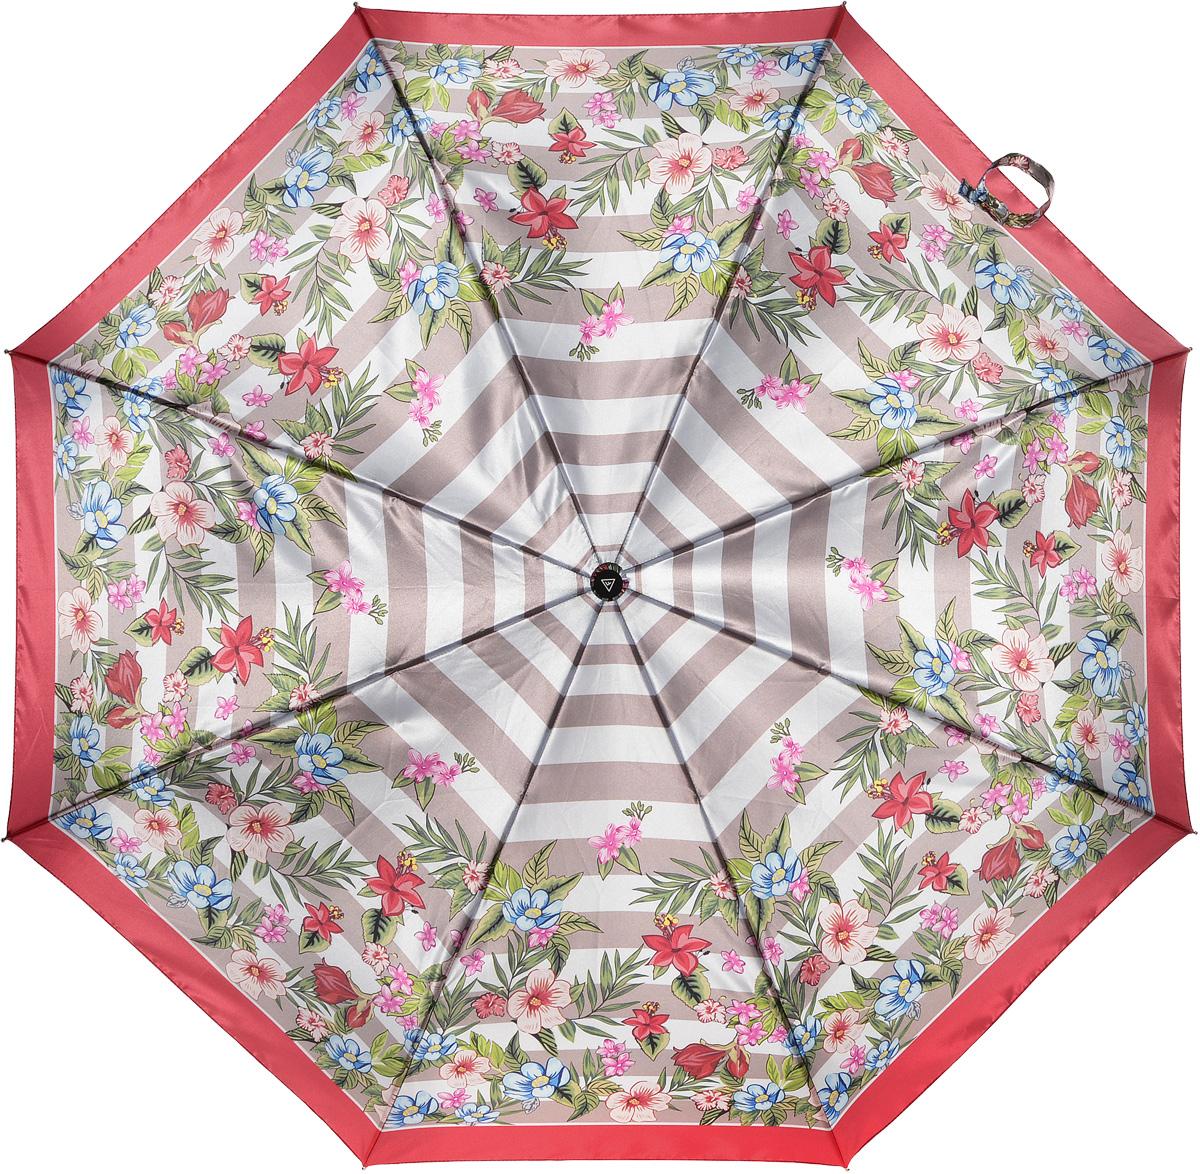 Зонт женский Fabretti, автомат, 3 сложения, цвет: мультиколор. L-16104-13L-16104-13Зонт женский Fabretti, облегченный суперавтомат, 3 сложения